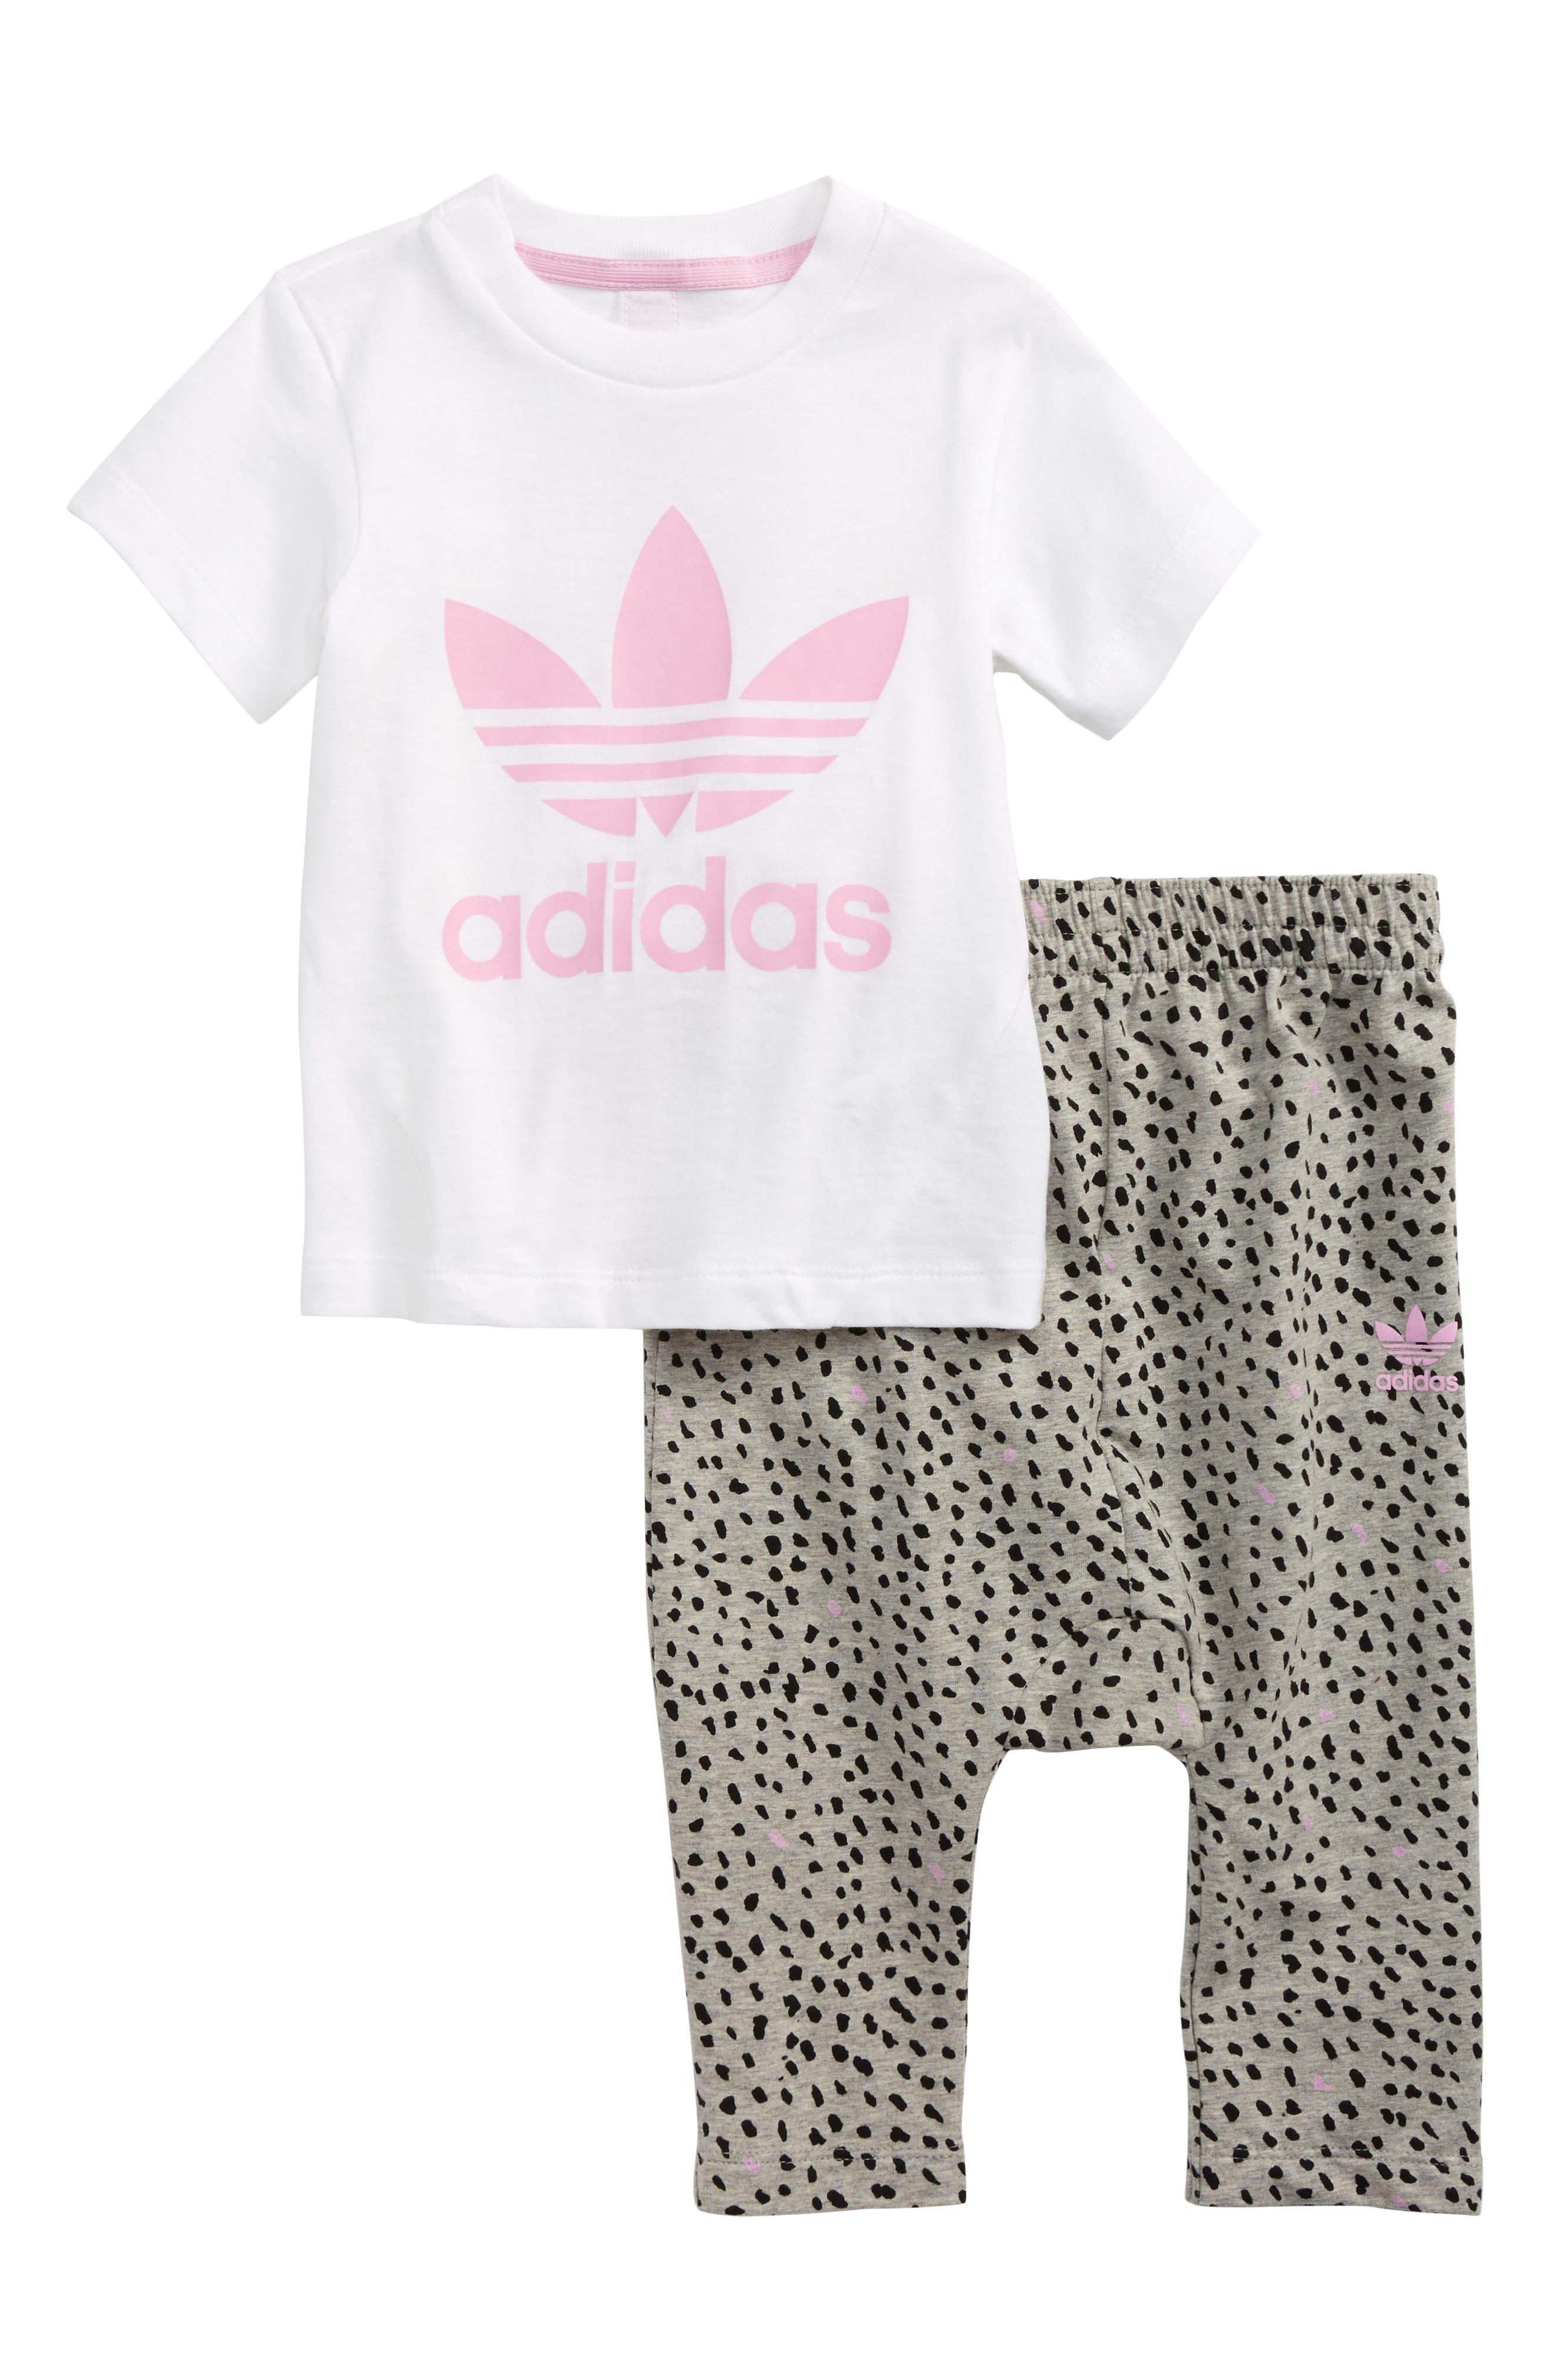 Main Image - adidas Originals Logo Tee & Print Leggings Set (Baby Girls)